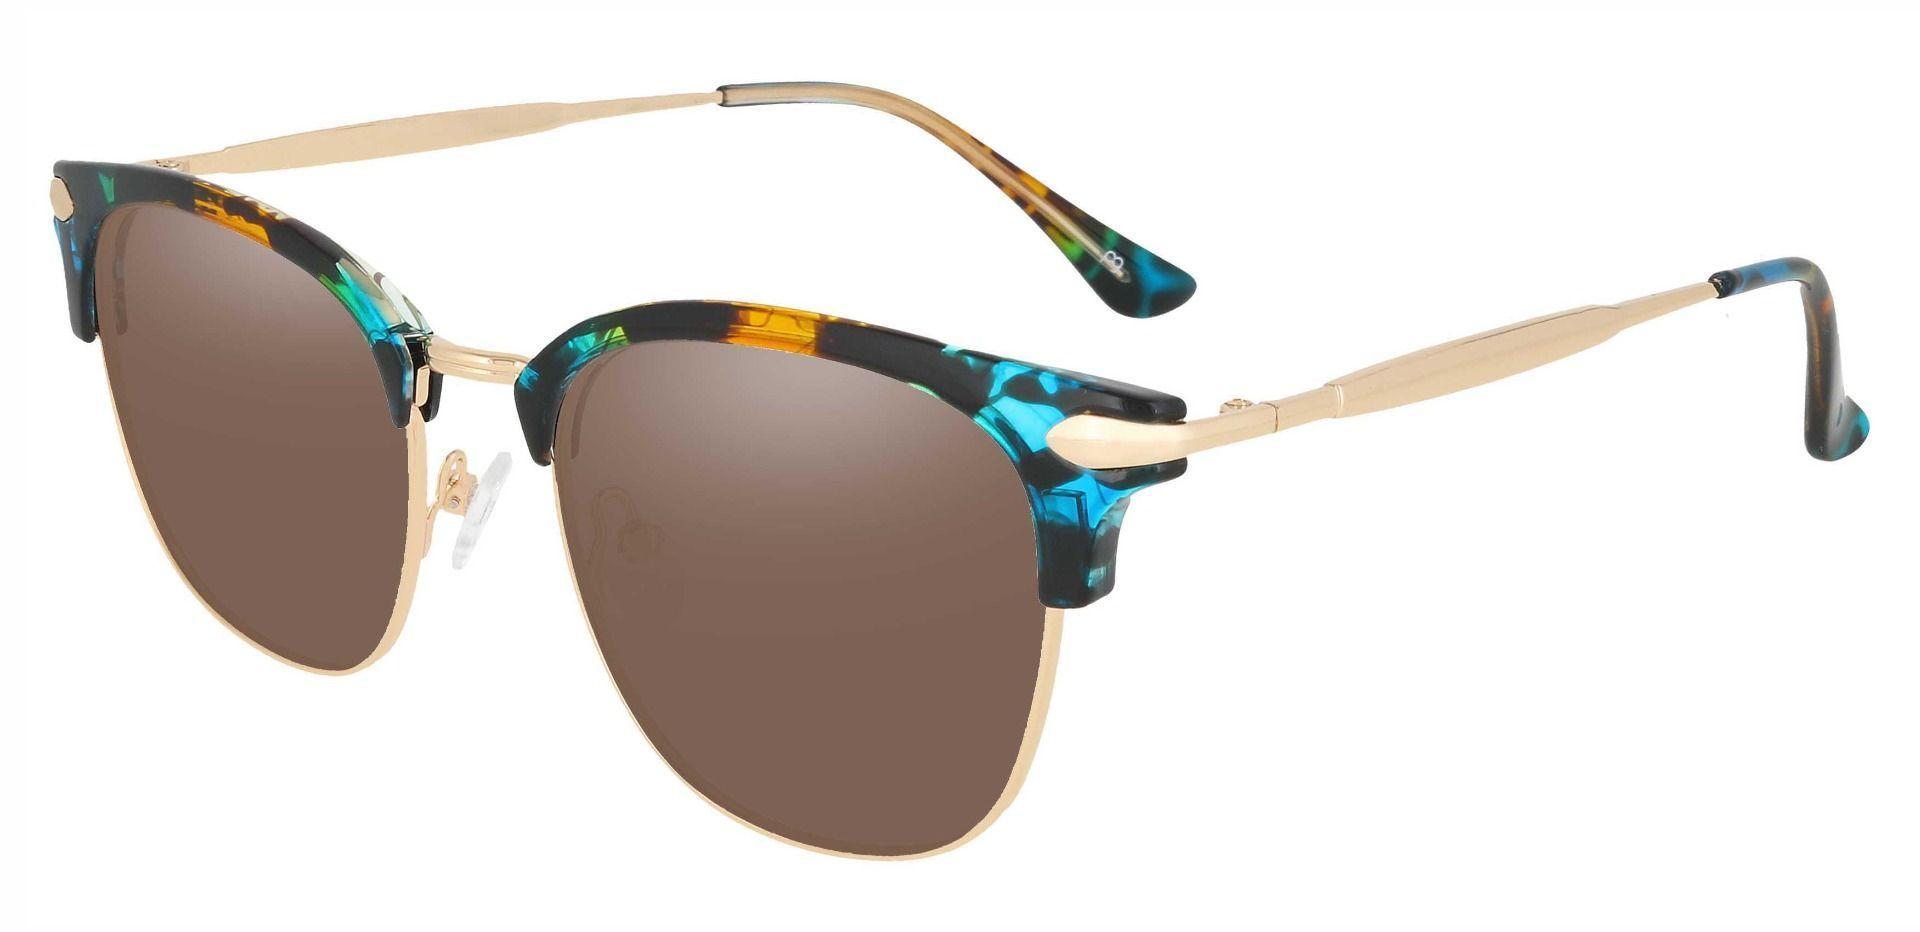 Webster Browline Prescription Sunglasses - Green Frame With Brown Lenses